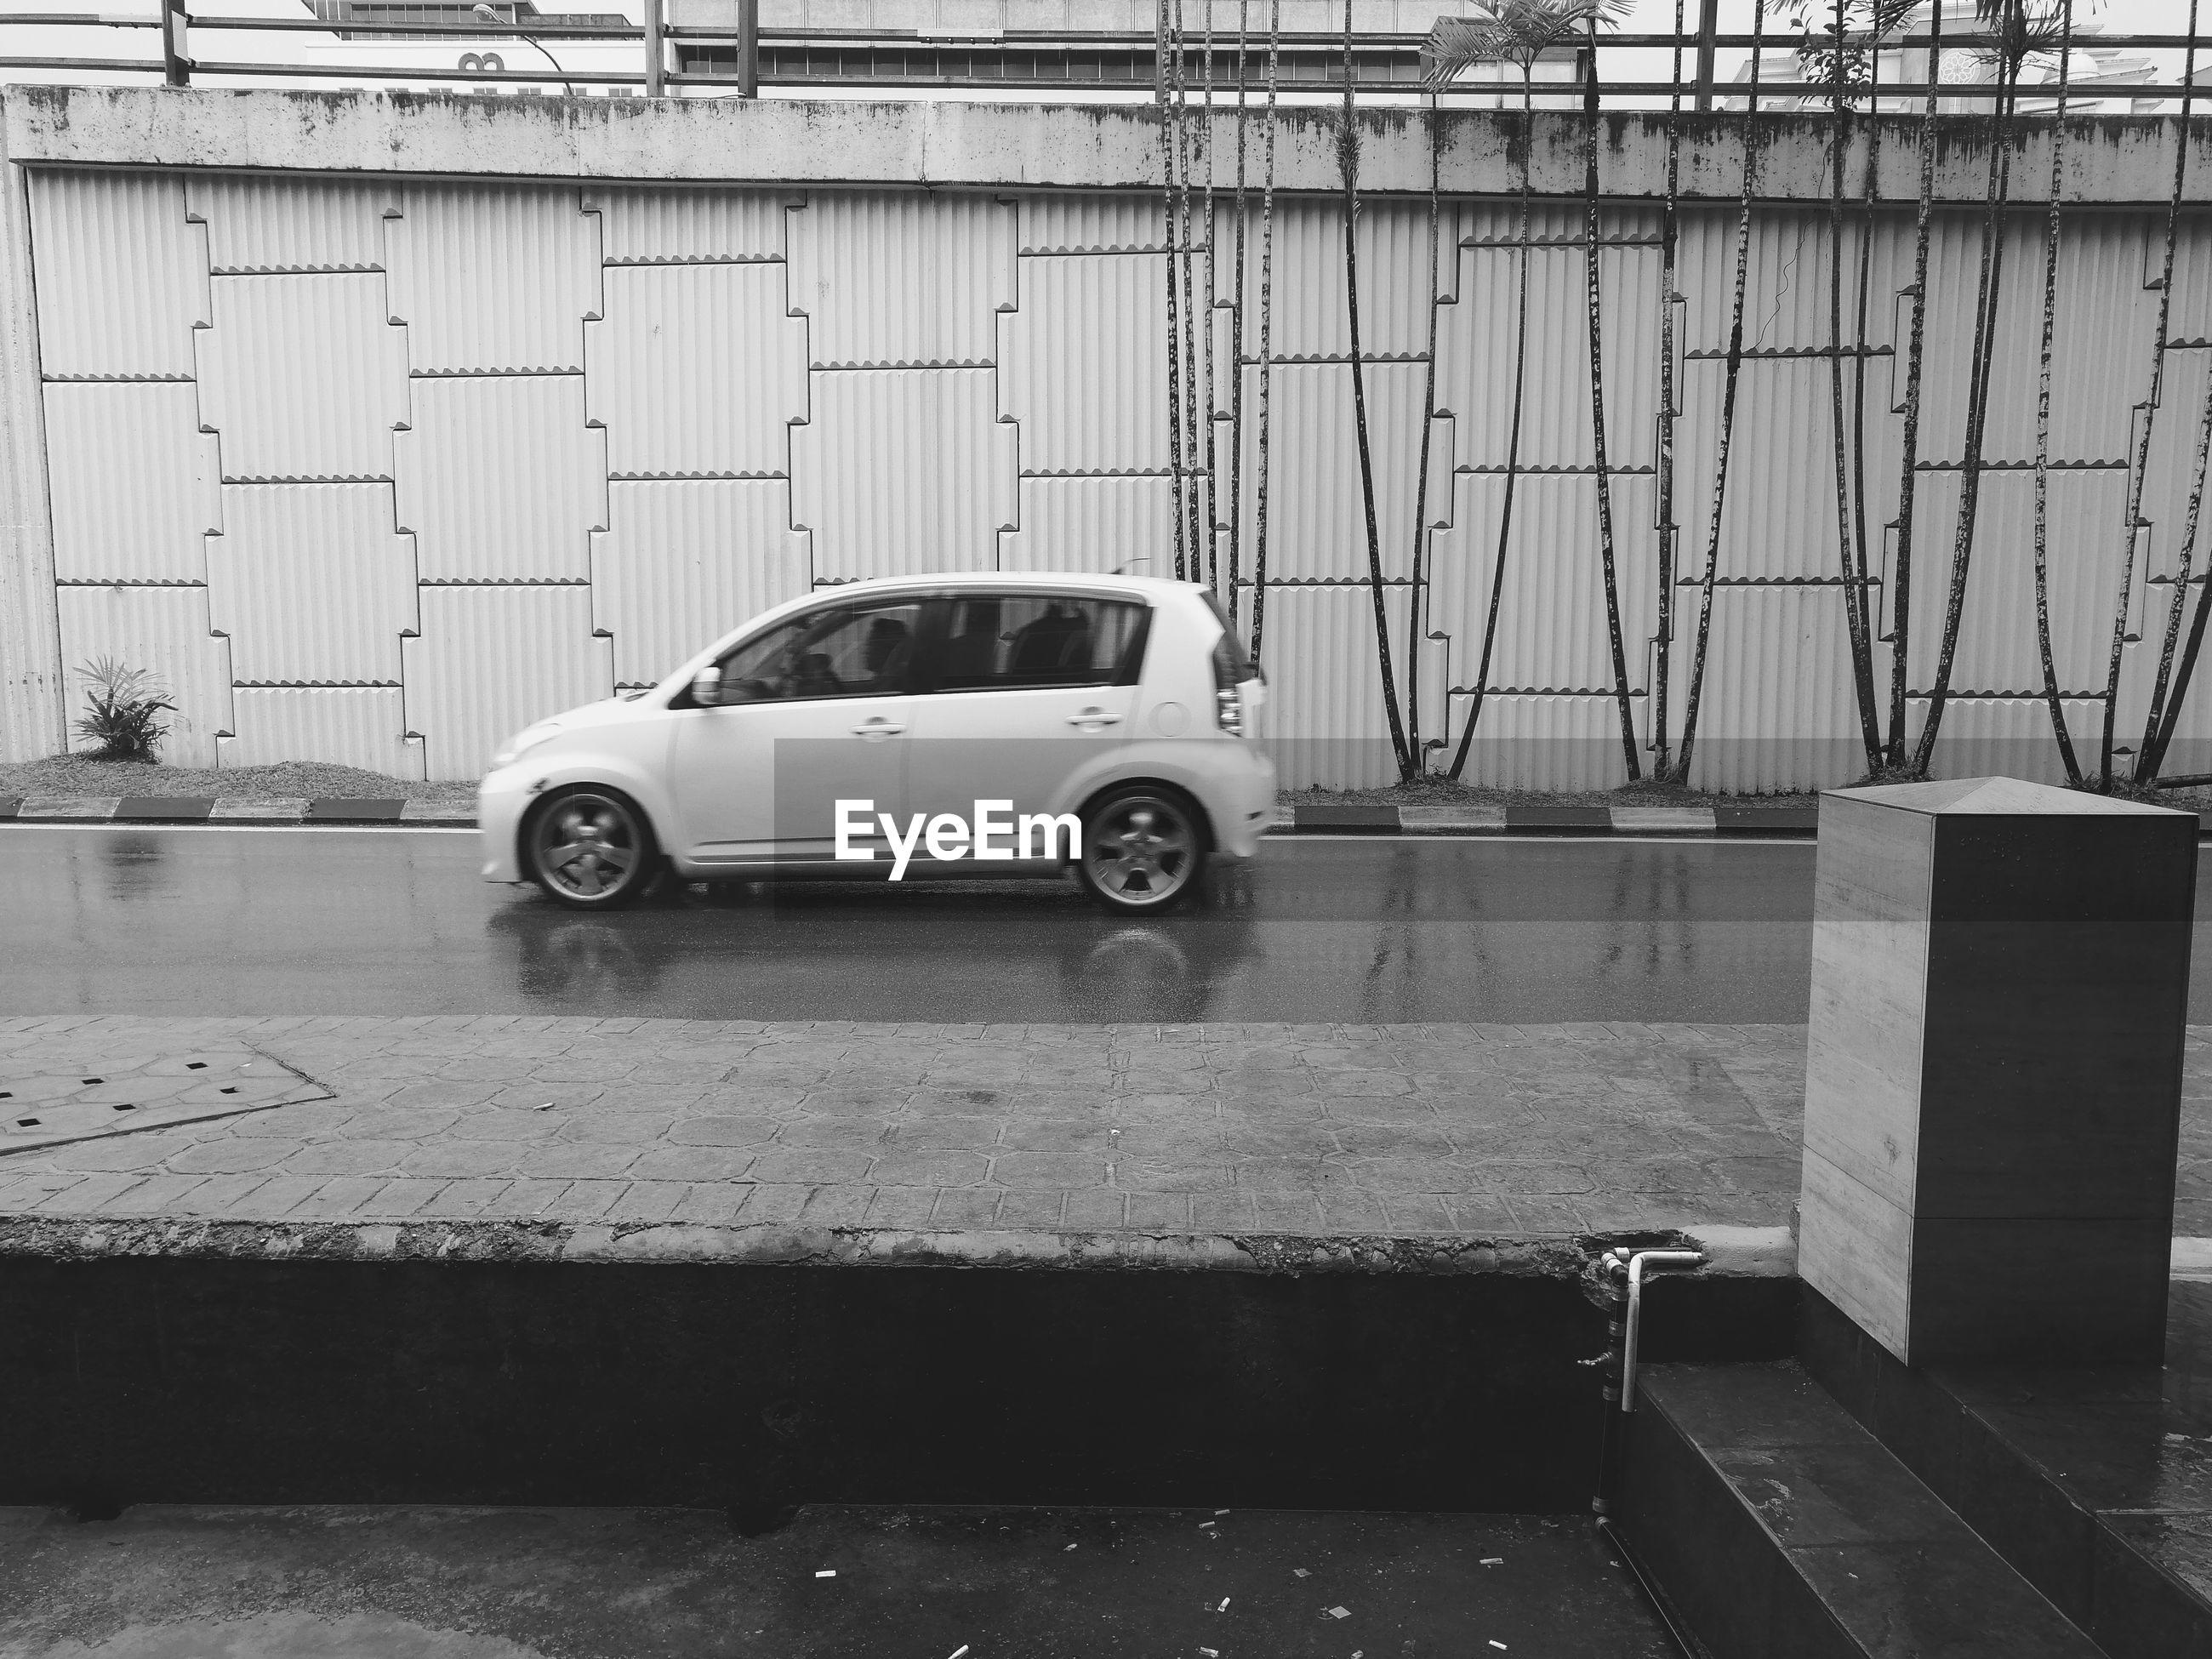 VINTAGE CAR ON ROAD AGAINST BUILDING IN CITY